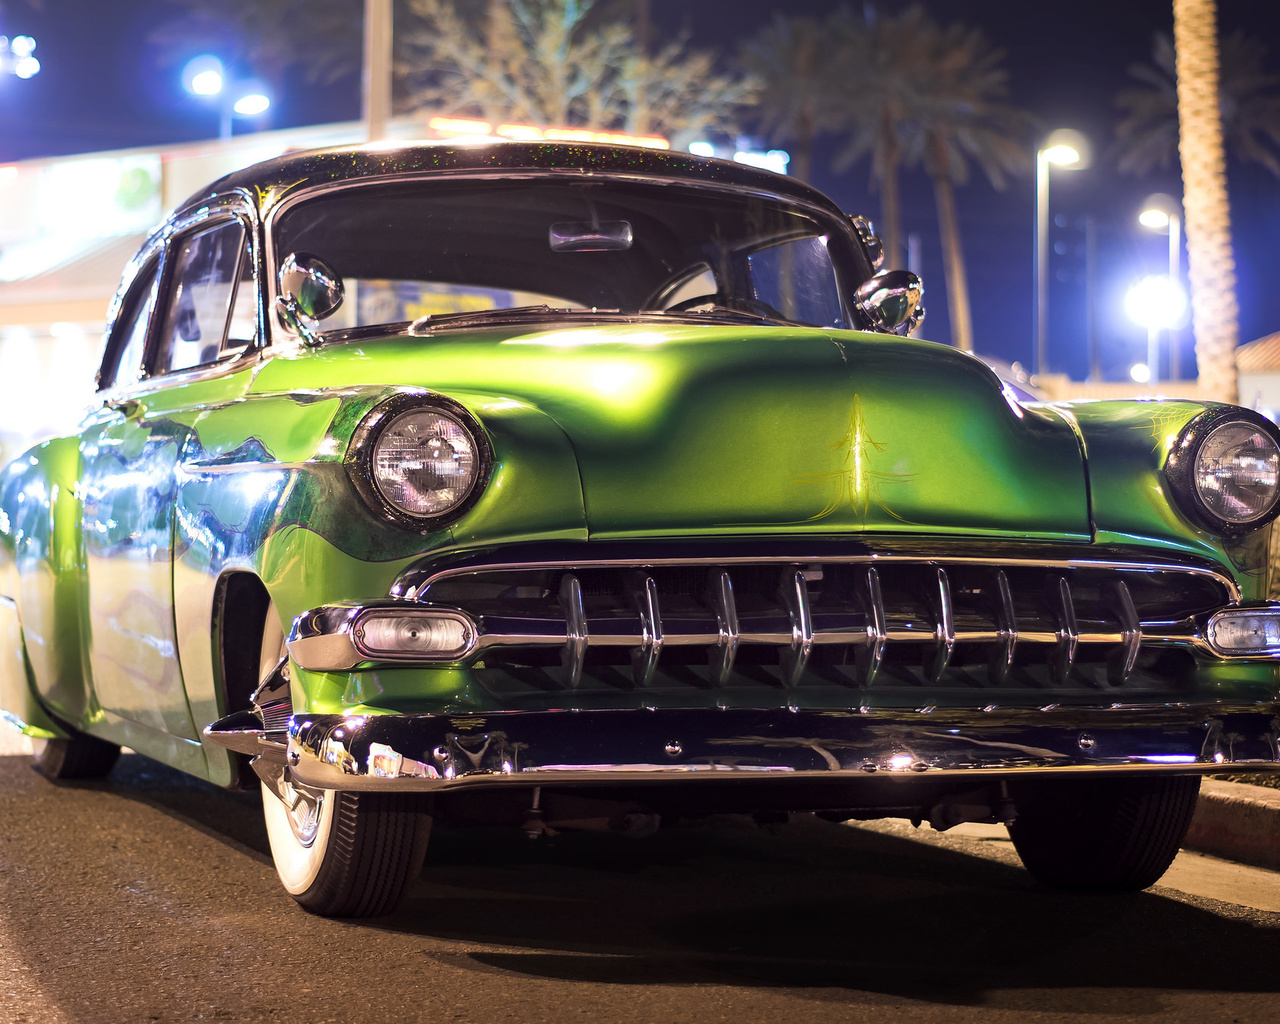 american, classic, car, chevrolet